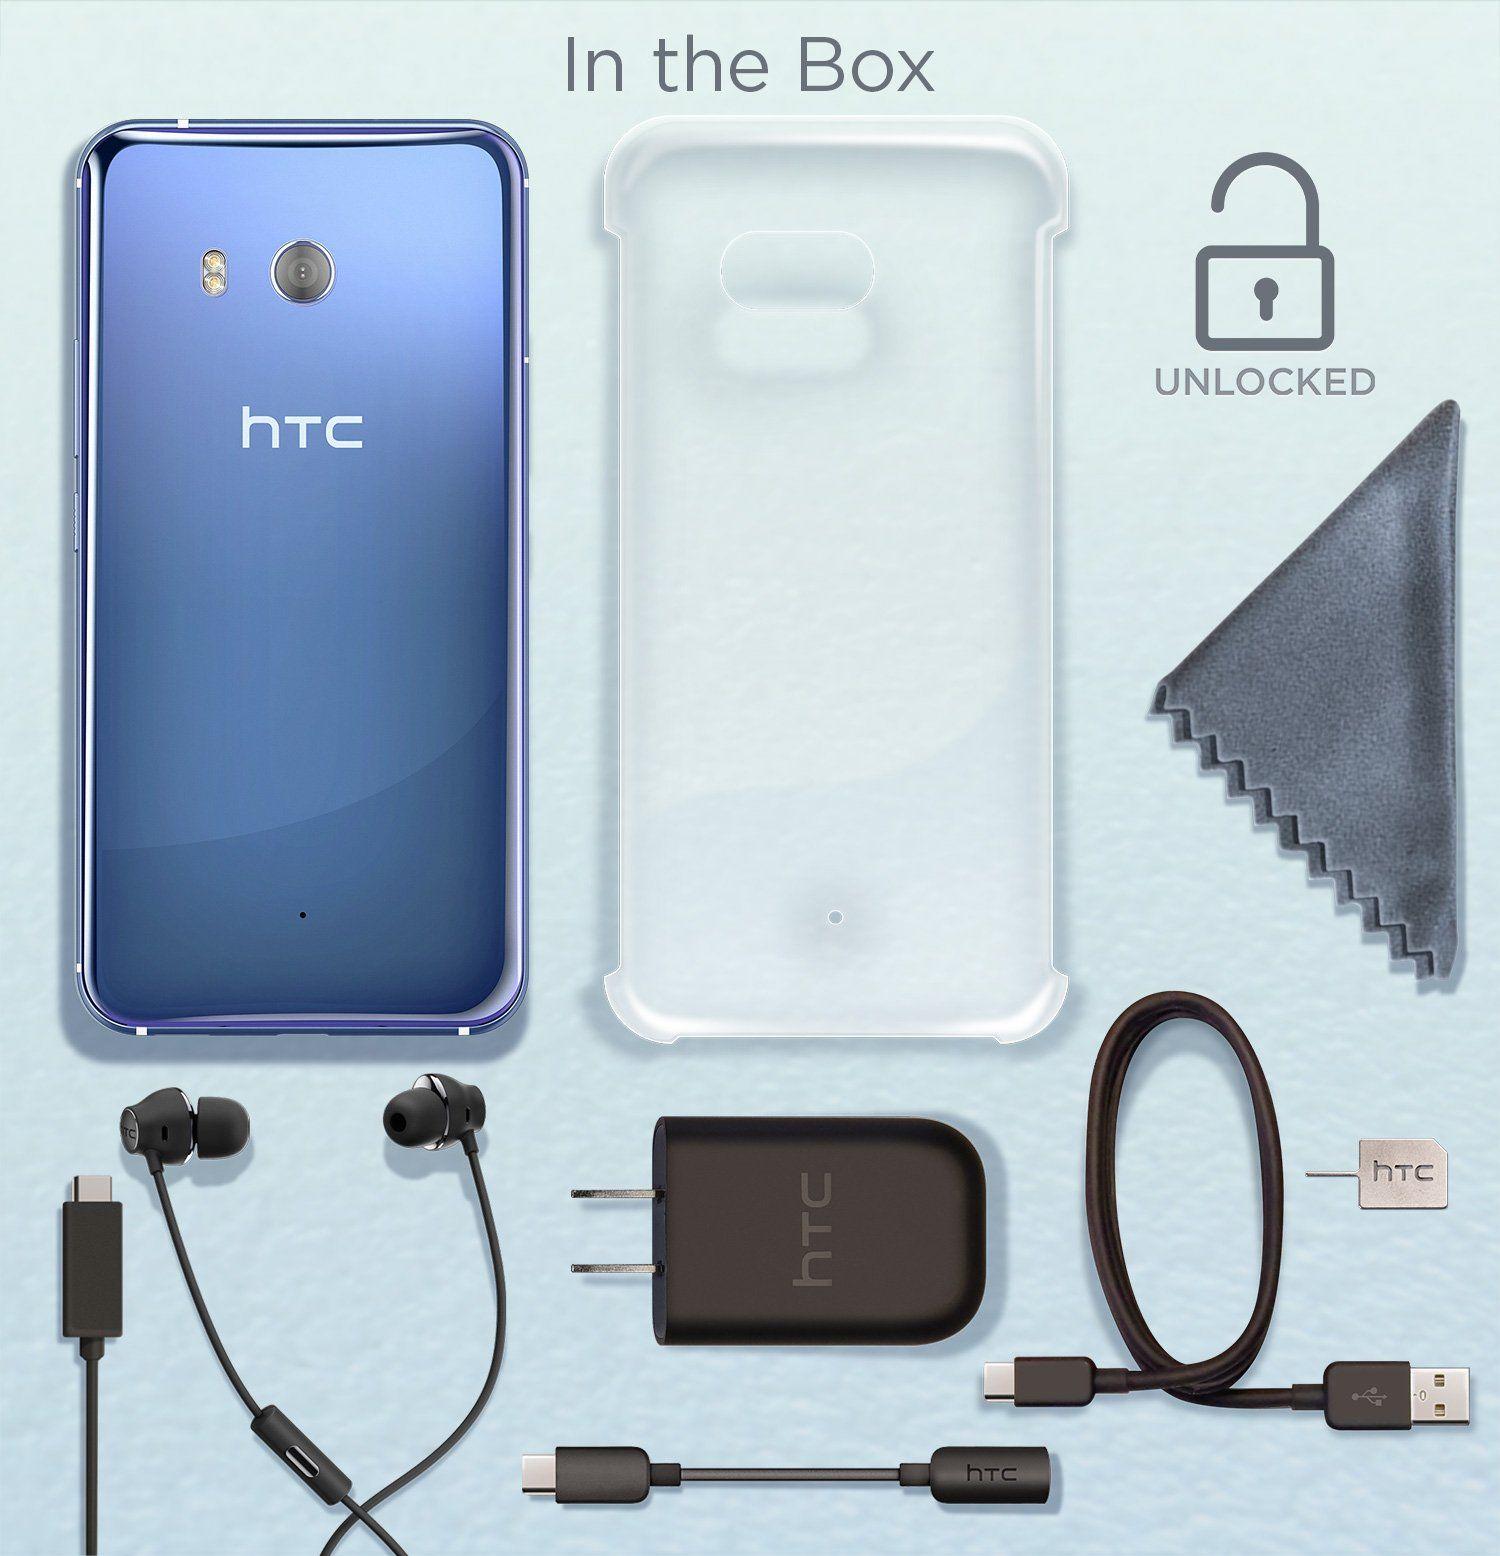 HTC U11 with handsfree Amazon Alexa – Factory Unlocked â